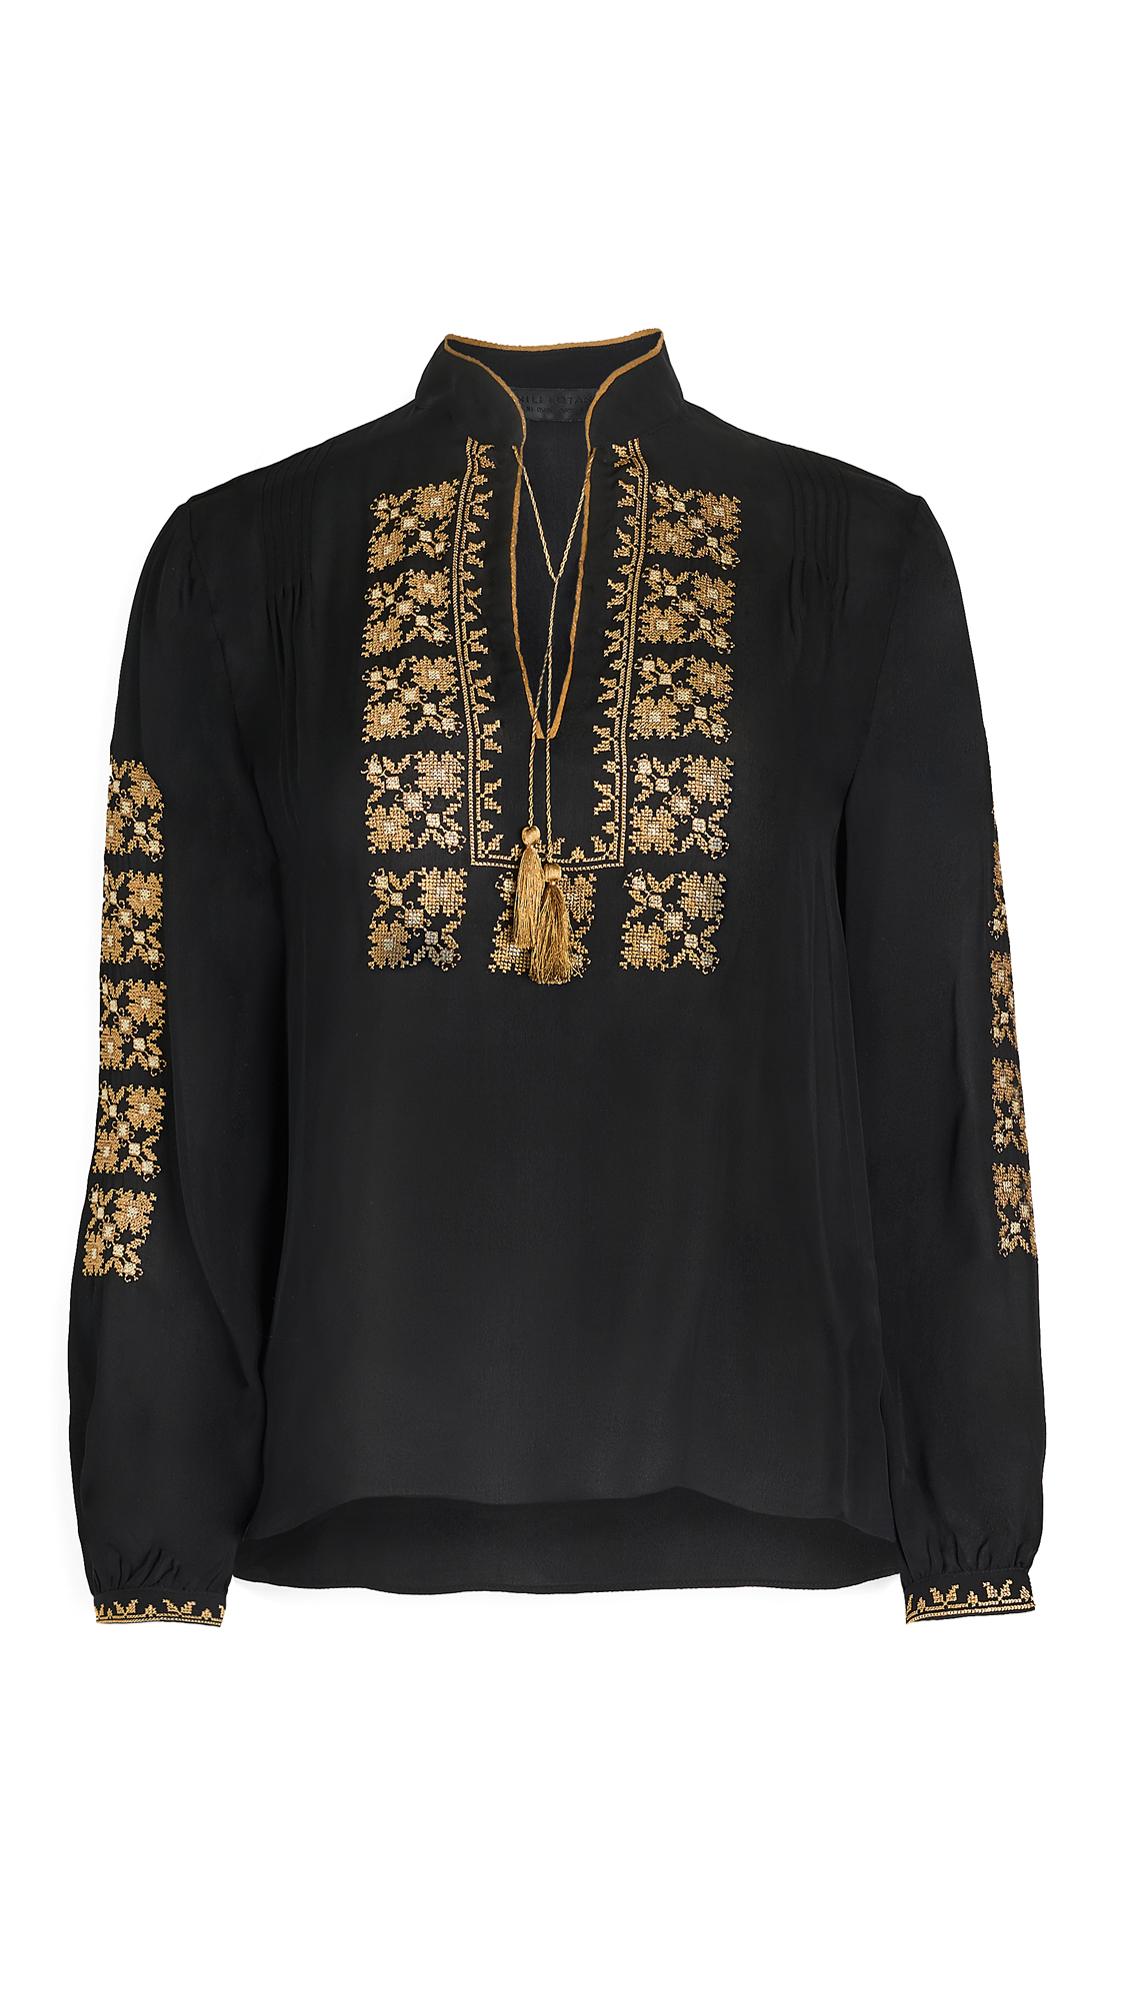 Nili Lotan Karina Palestinian Embroidered Top - 30% Off Sale